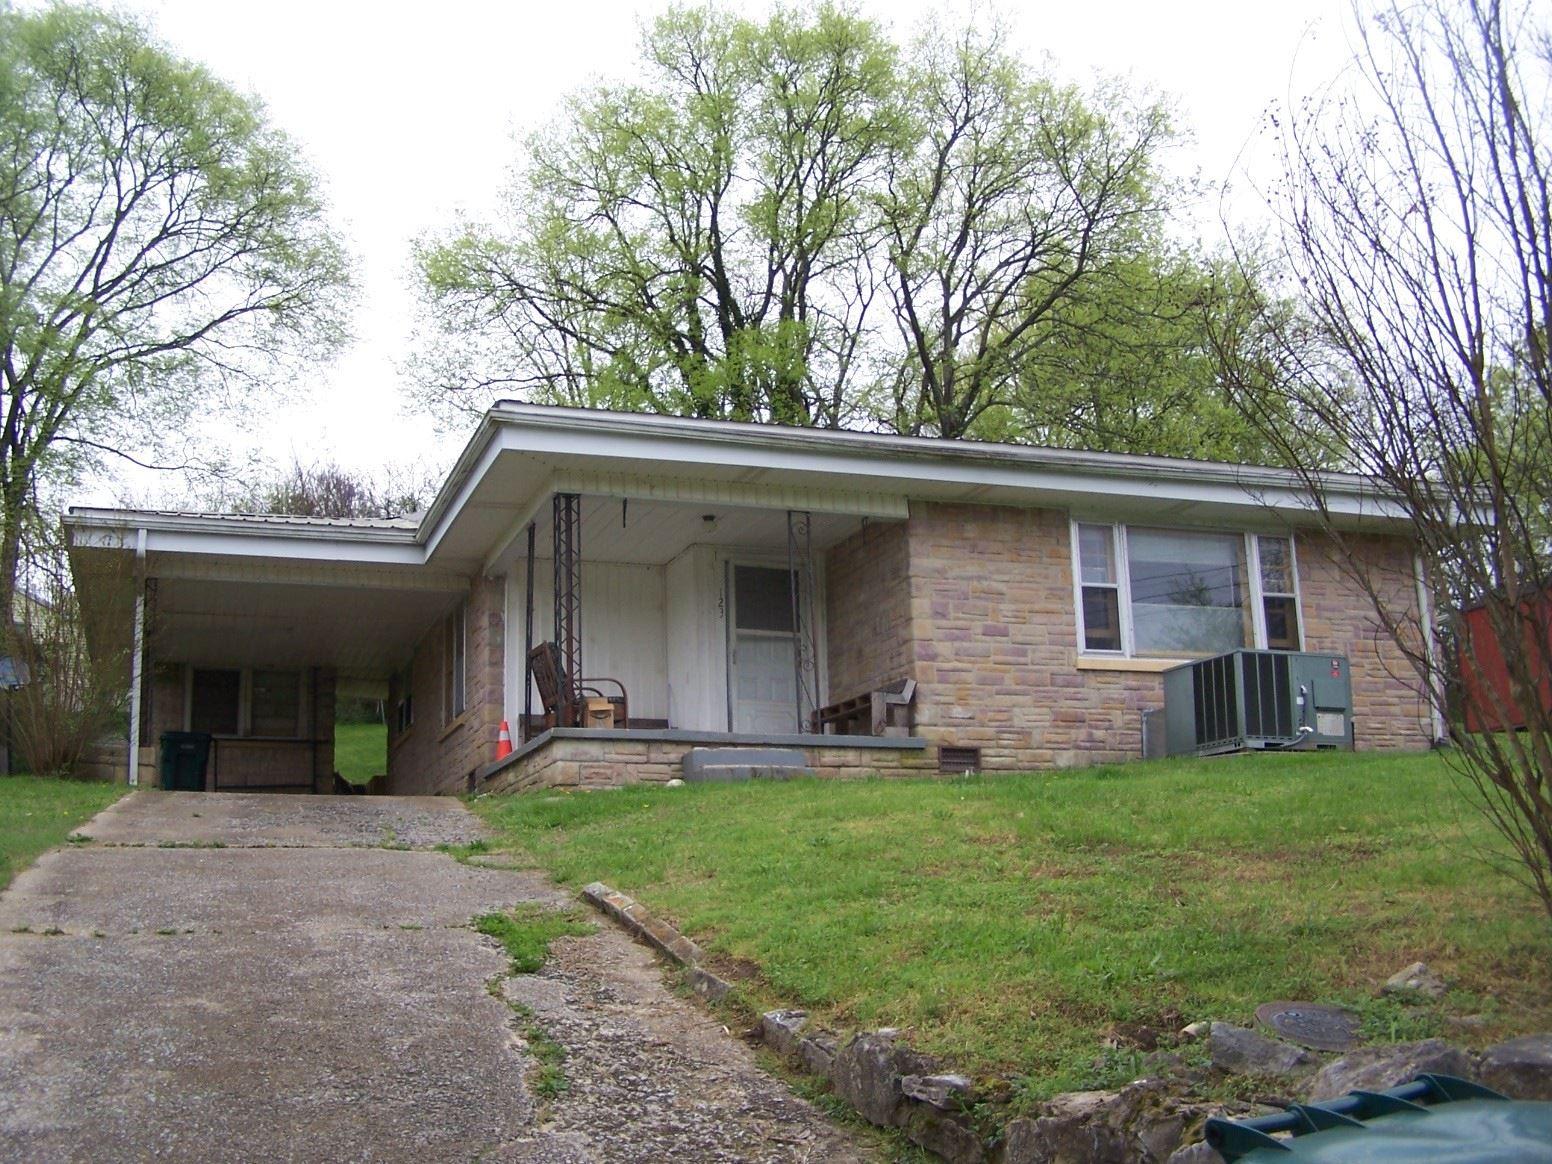 123 Circle Dr, Pulaski, TN 38478 - MLS#: 2162378